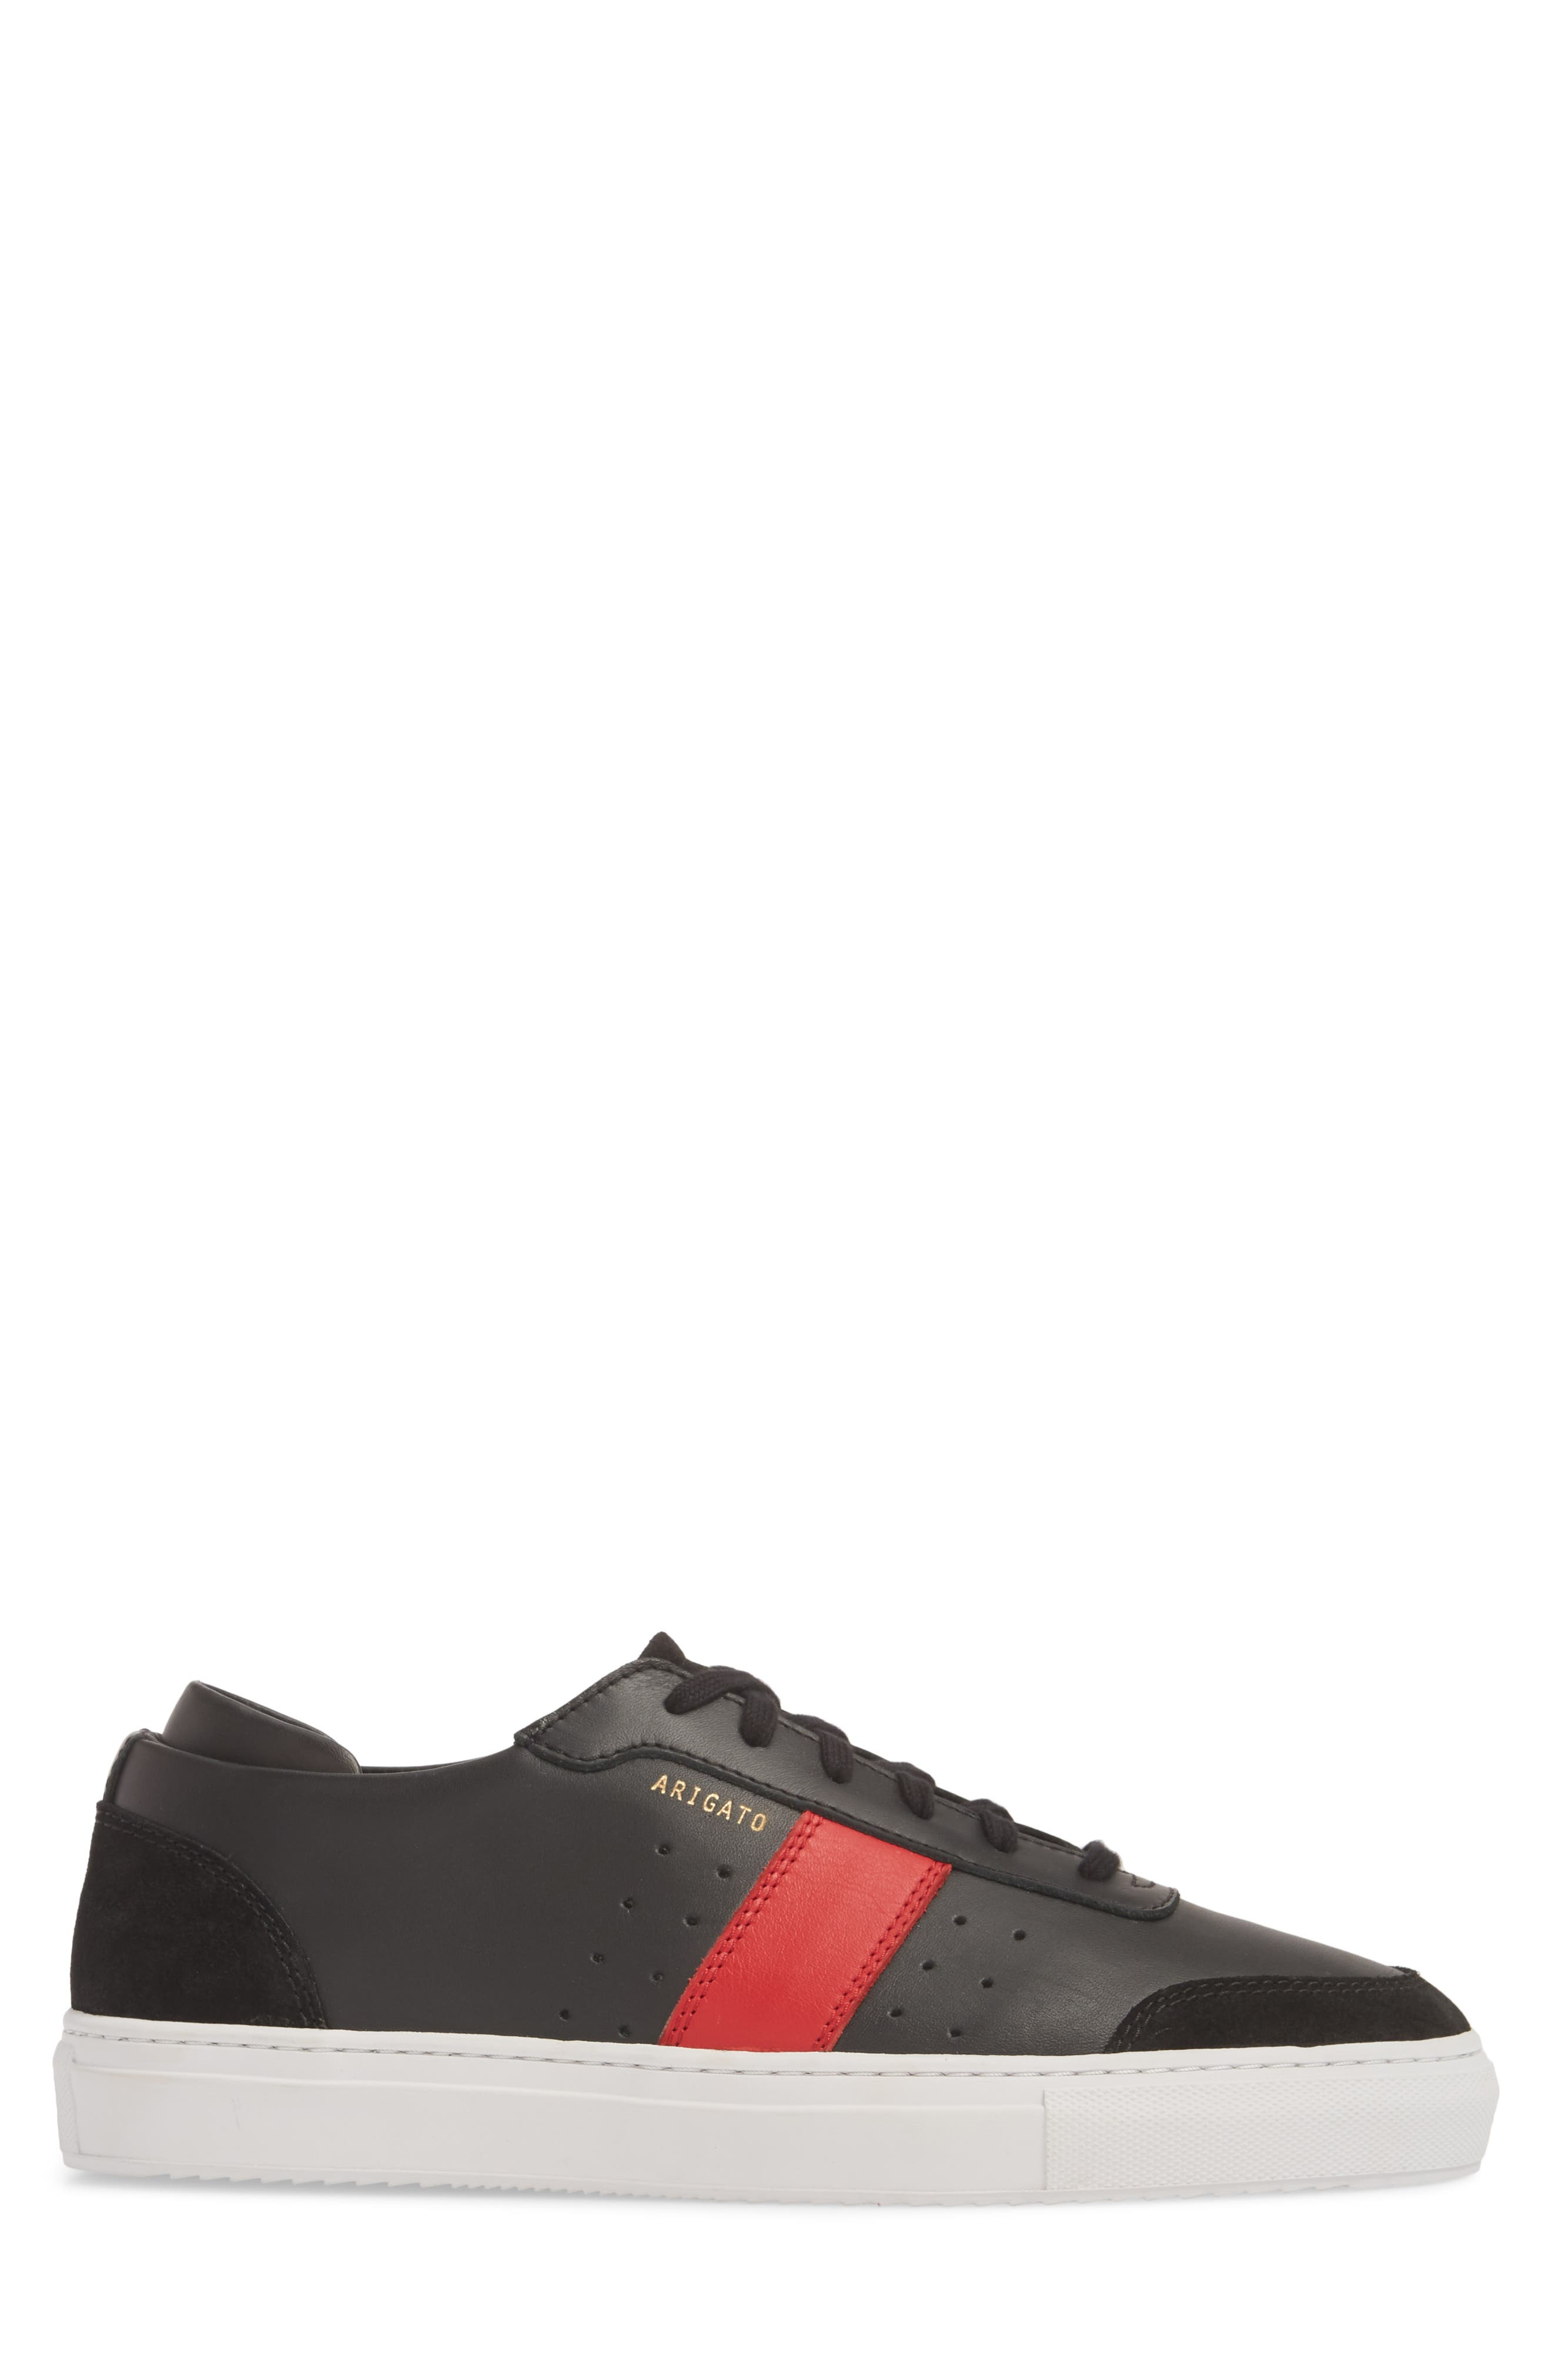 Dunk Sneaker,                             Alternate thumbnail 3, color,                             BLACK/ BLACK